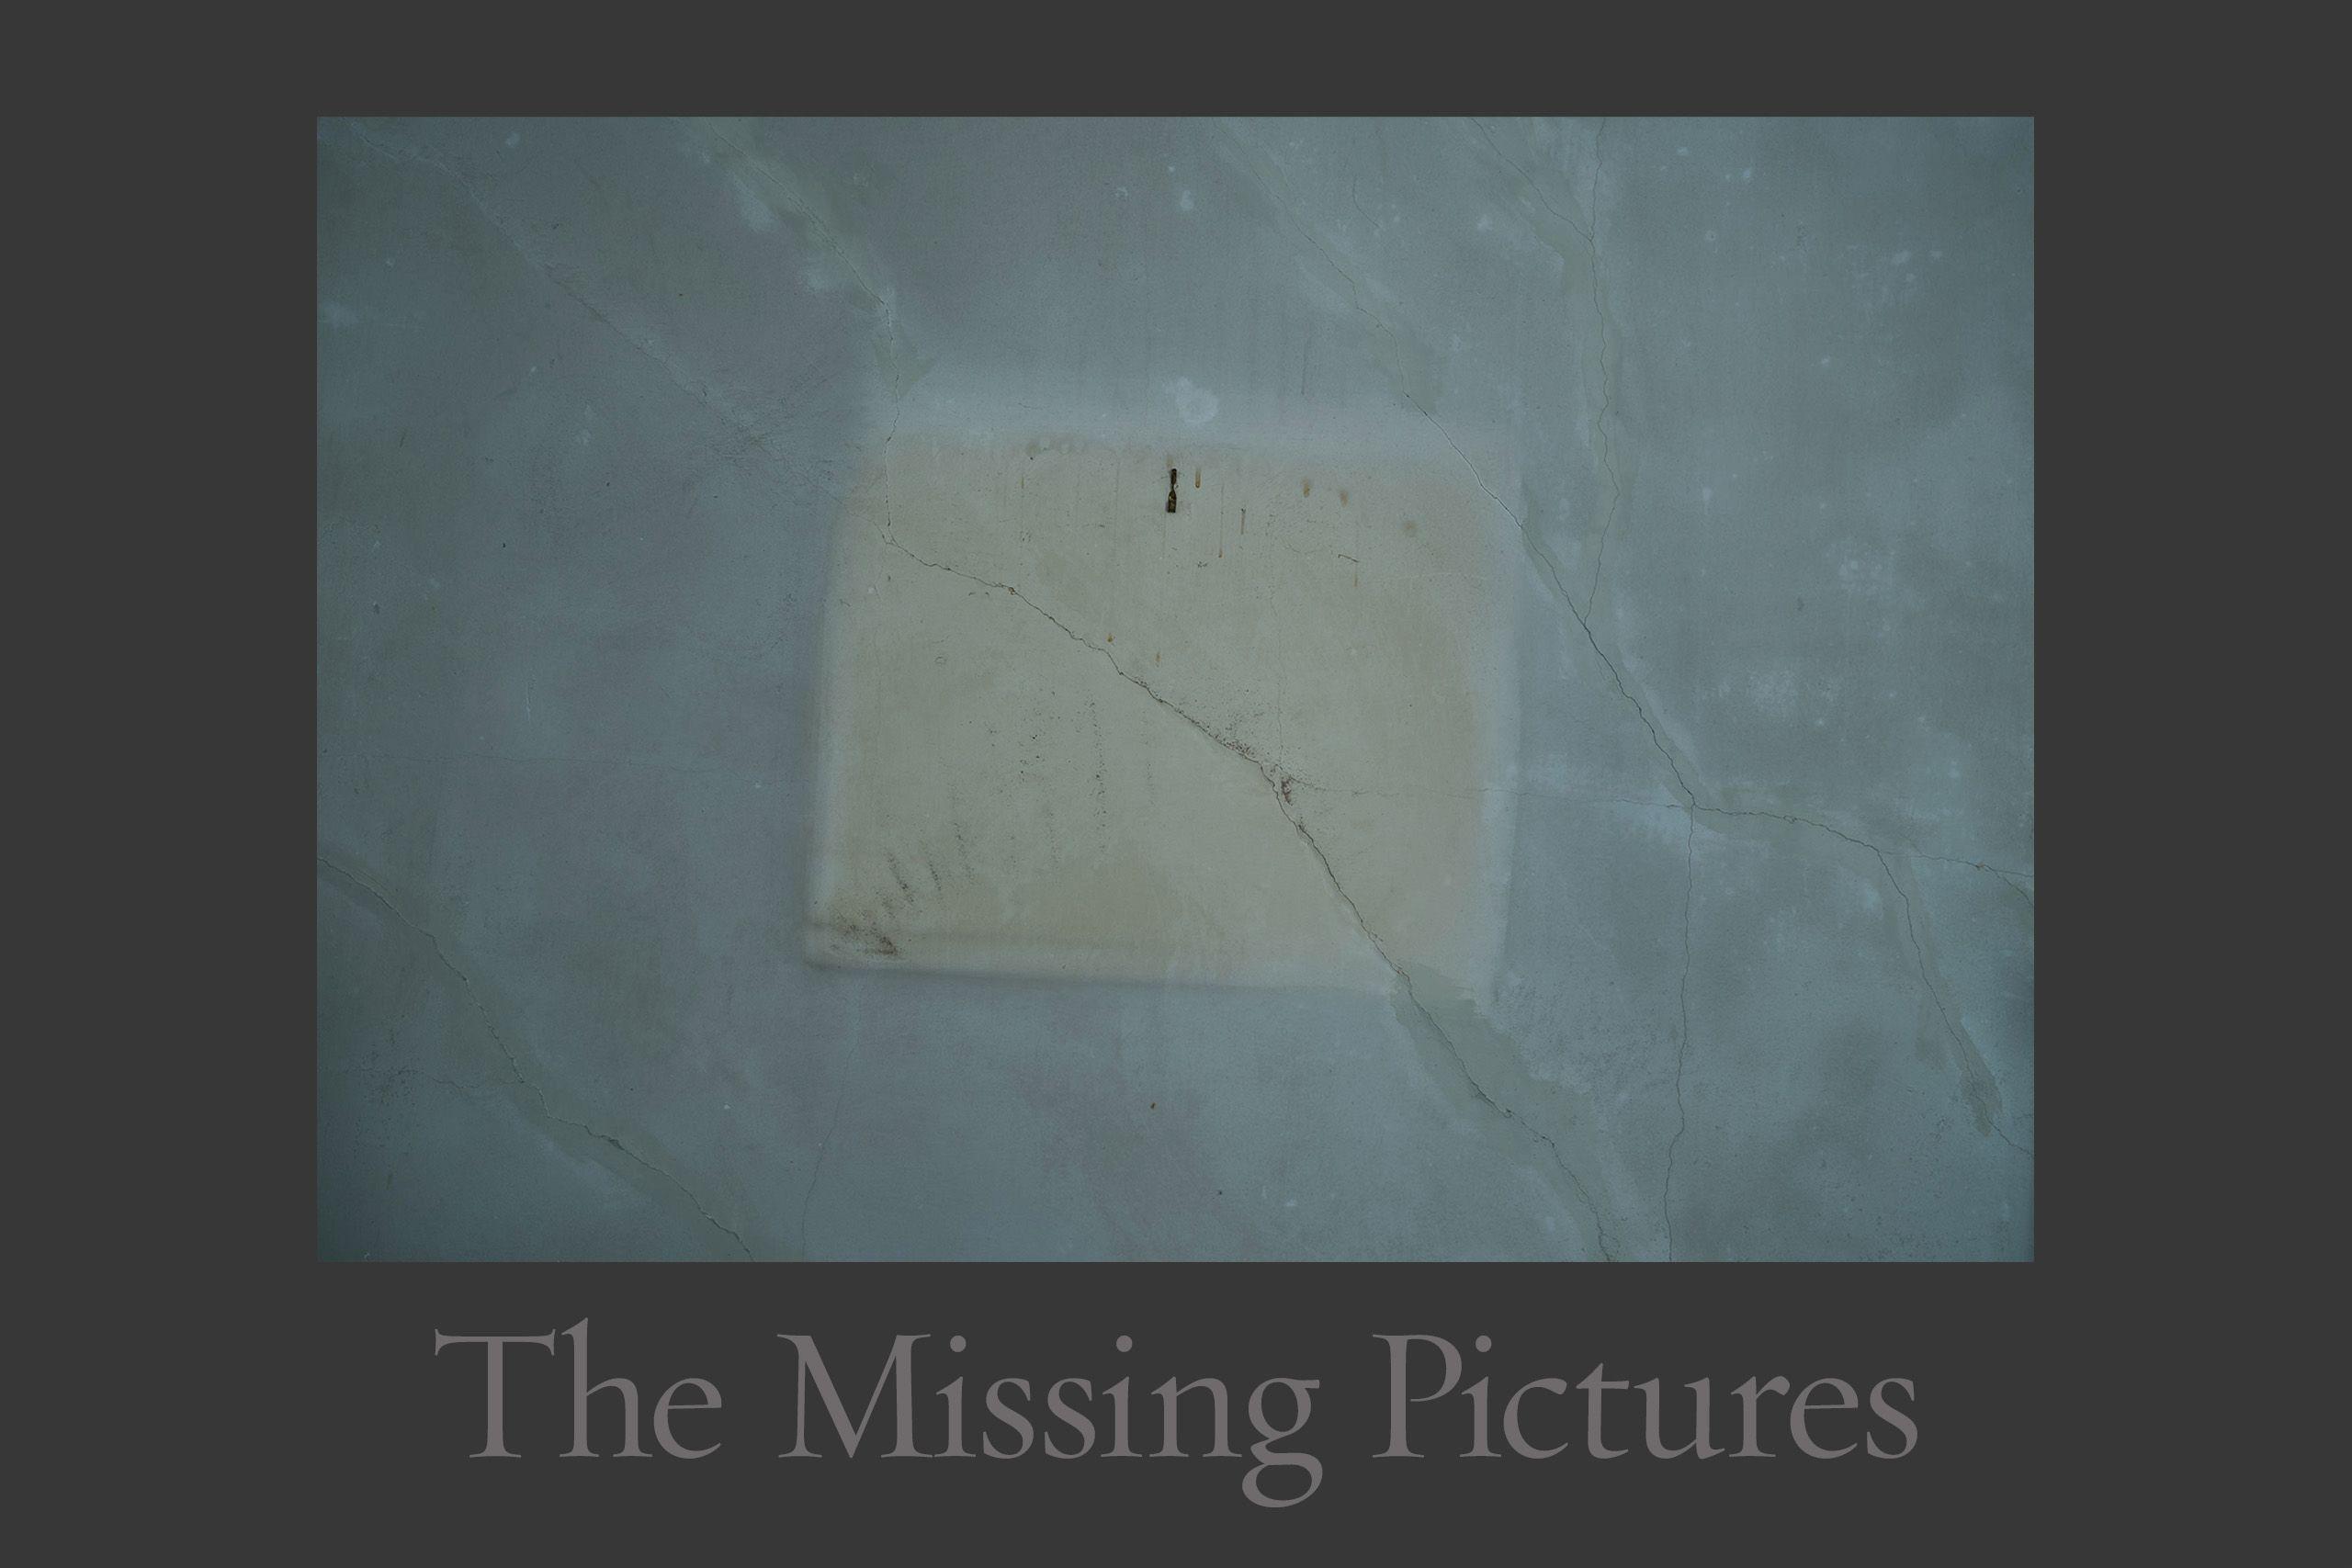 Missing pictures slide v2.jpg